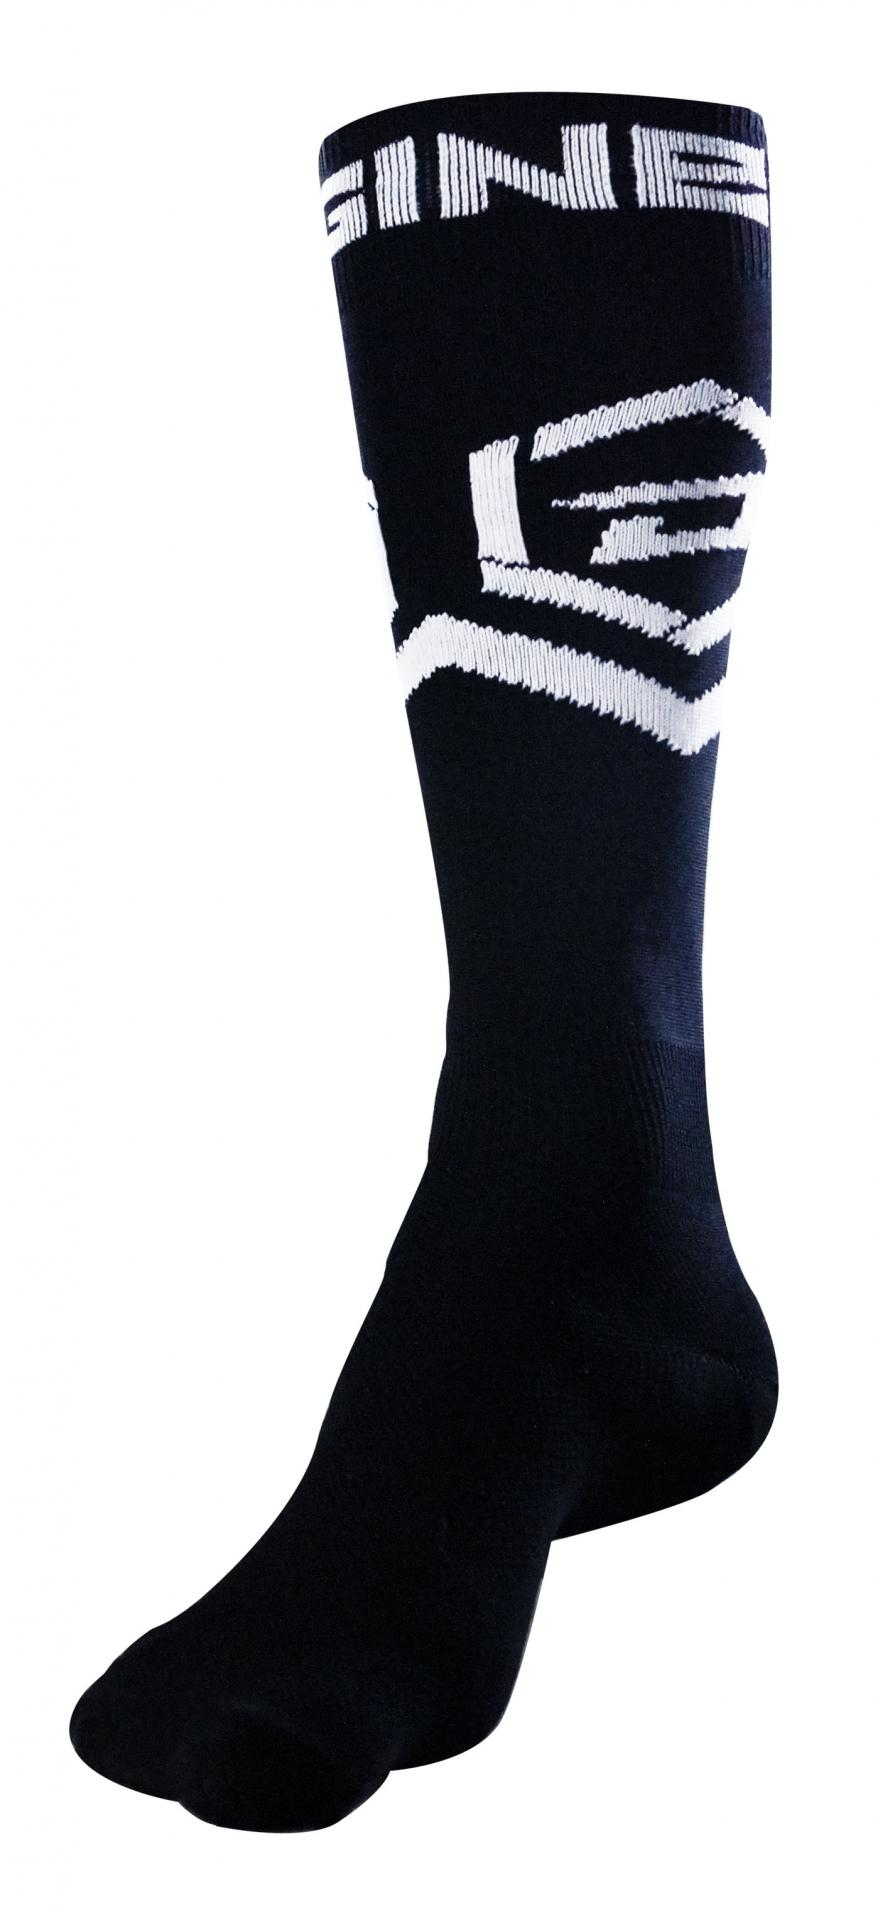 Socks 2017 noir longue1